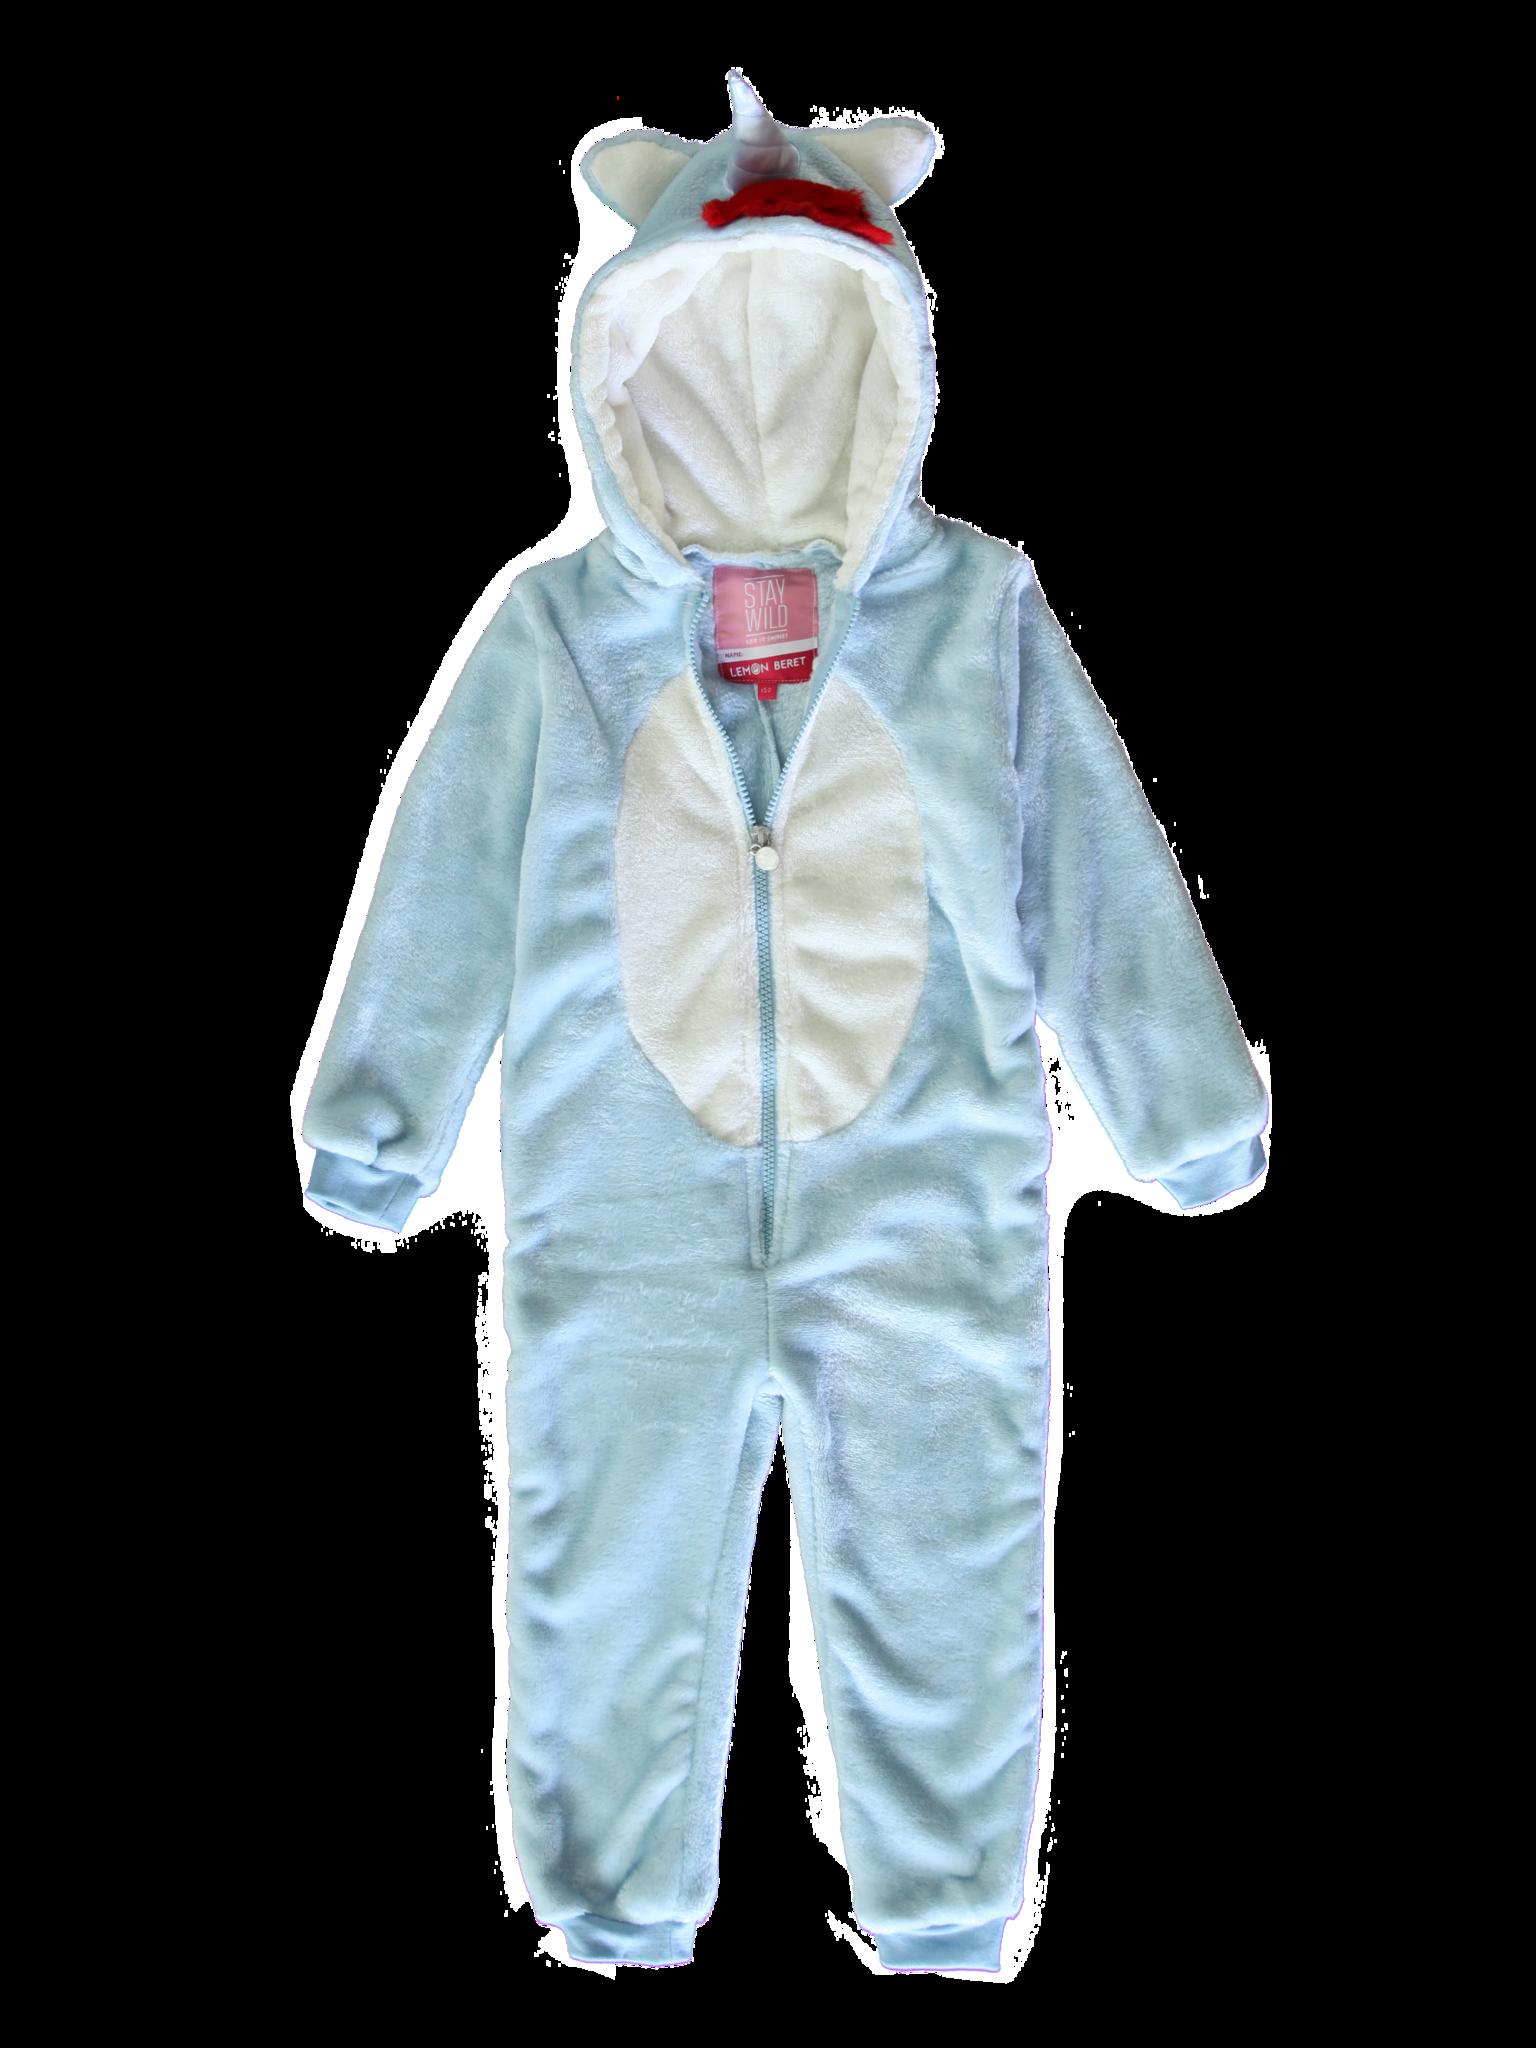 All Brands | Winterproducts Teen Girls | Nightwear | 12 pcs/box